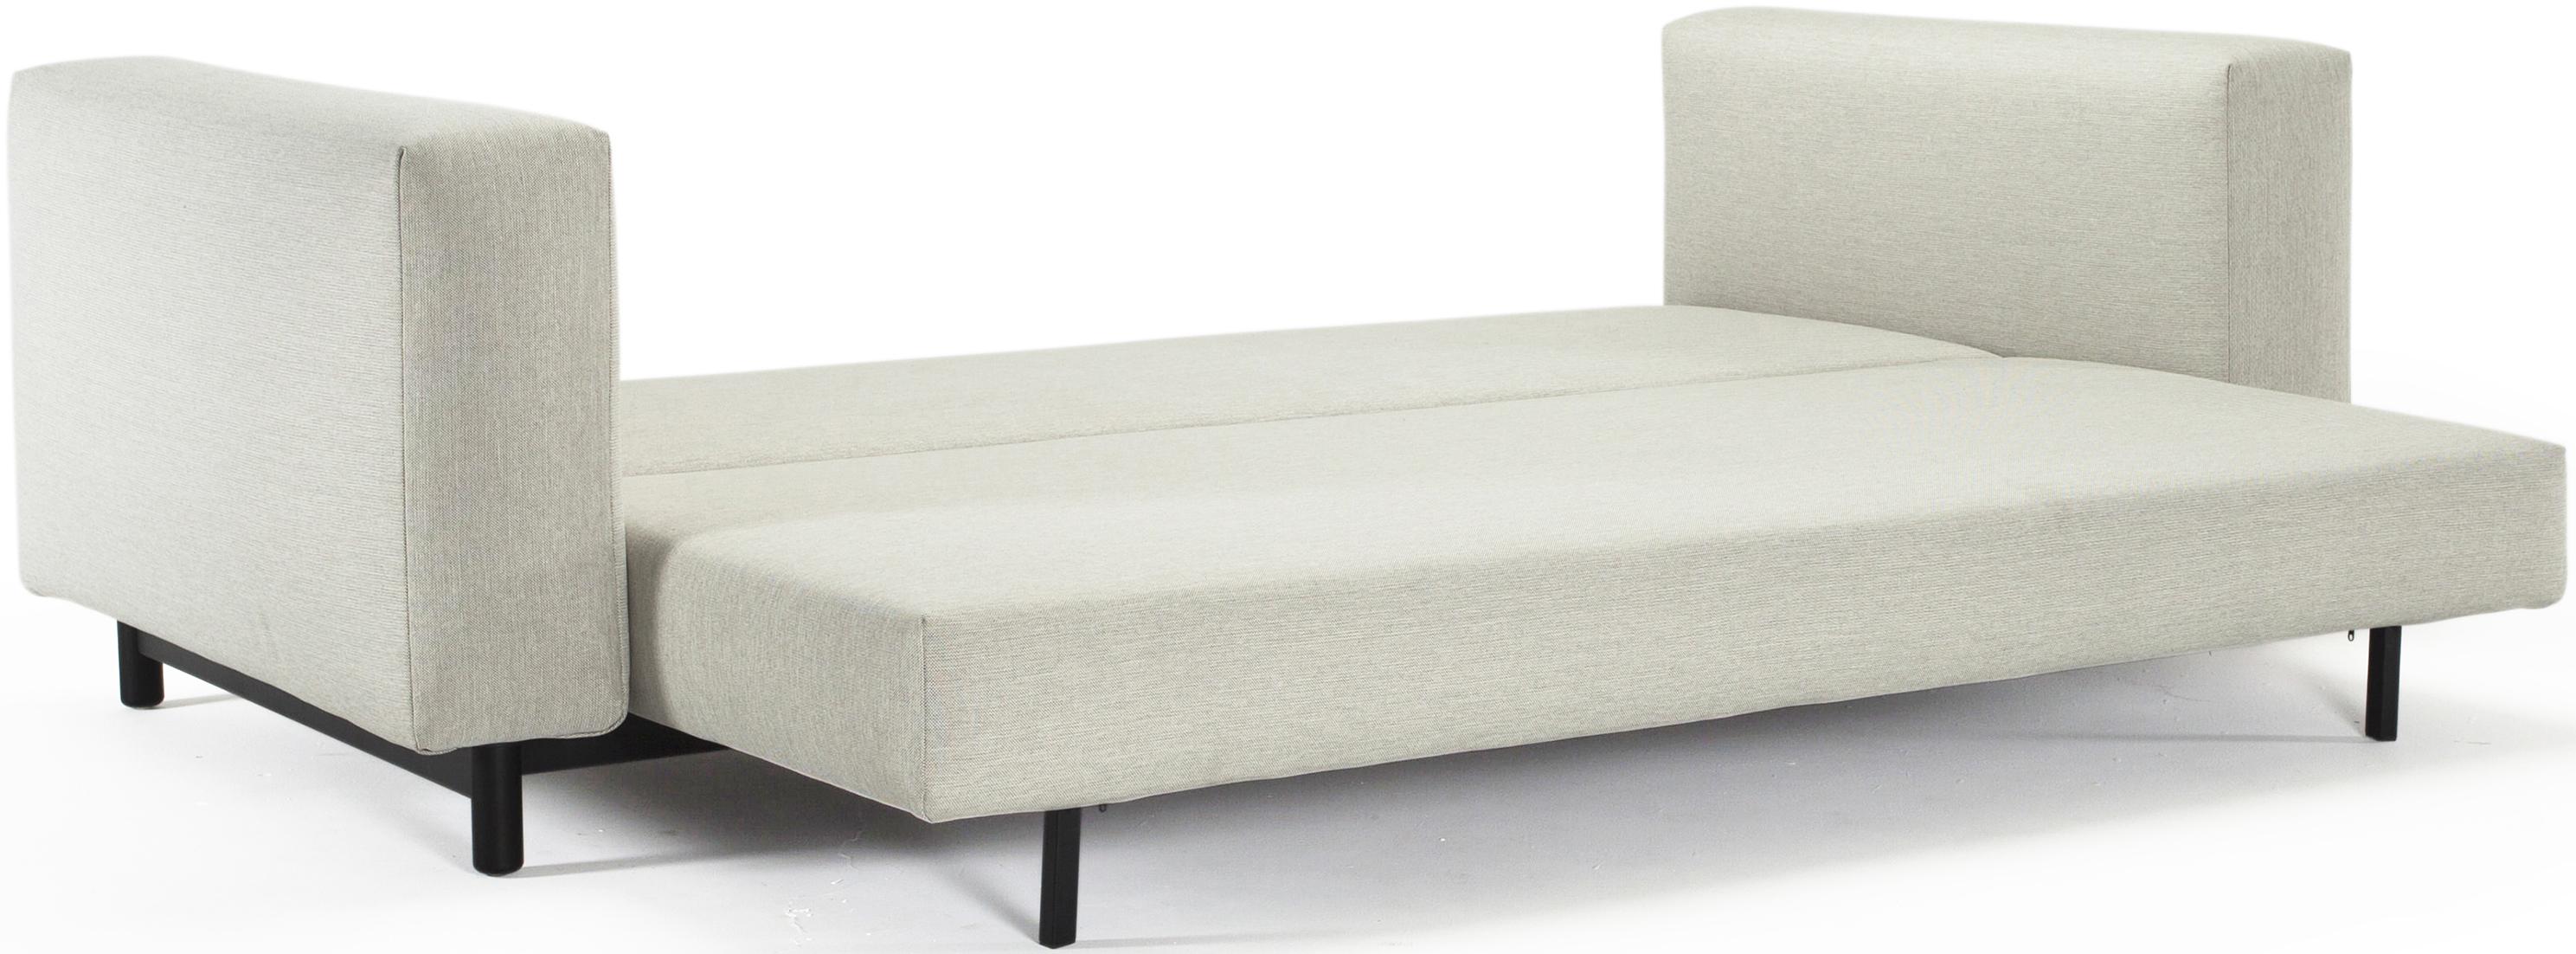 innovation magni sofa bed